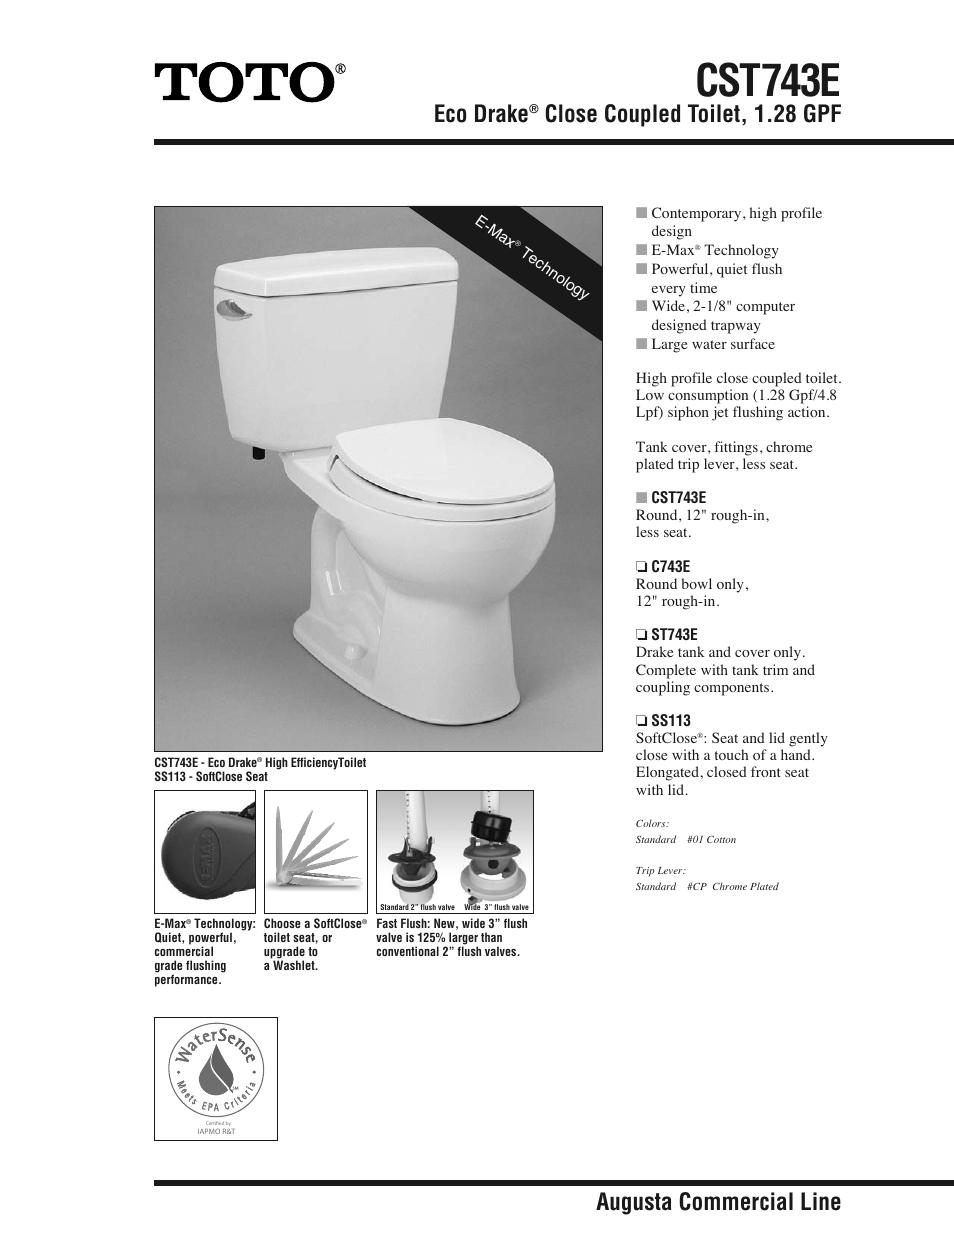 Factory Direct Hardware Toto CST743E Eco Drake User Manual